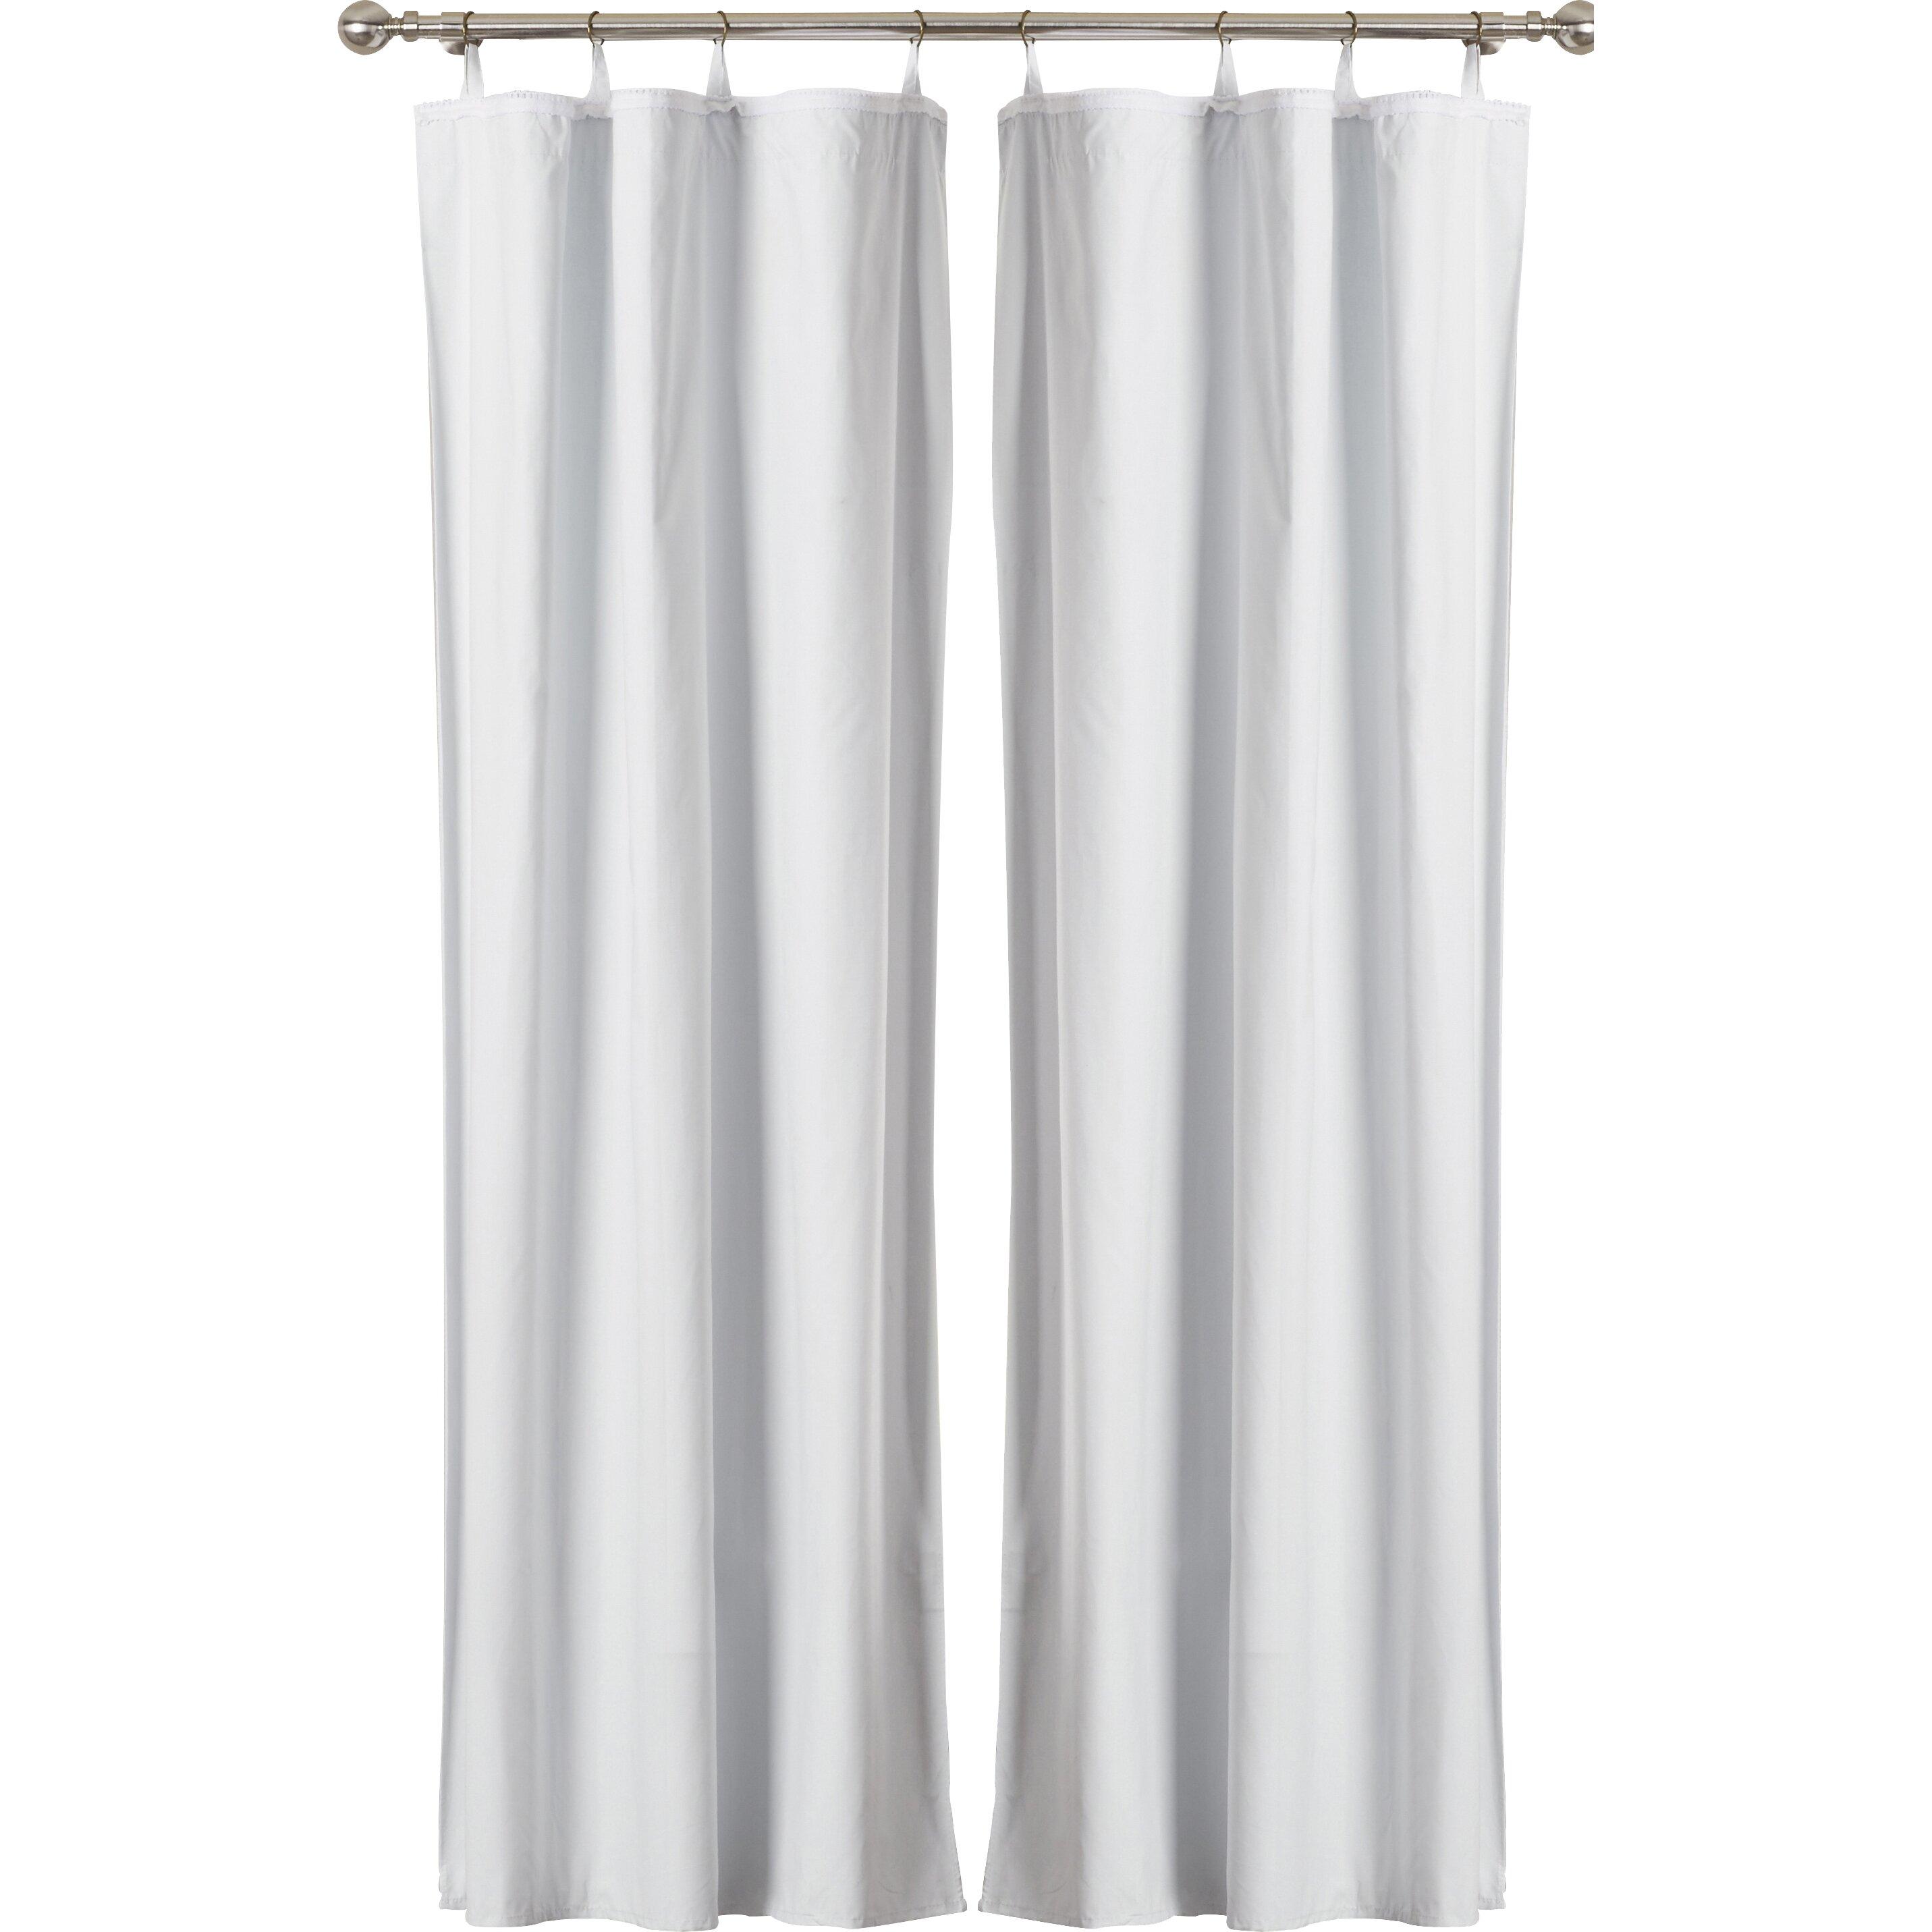 Alcott Hill Dorset Panel Curtain Liner Reviews Birch Lane